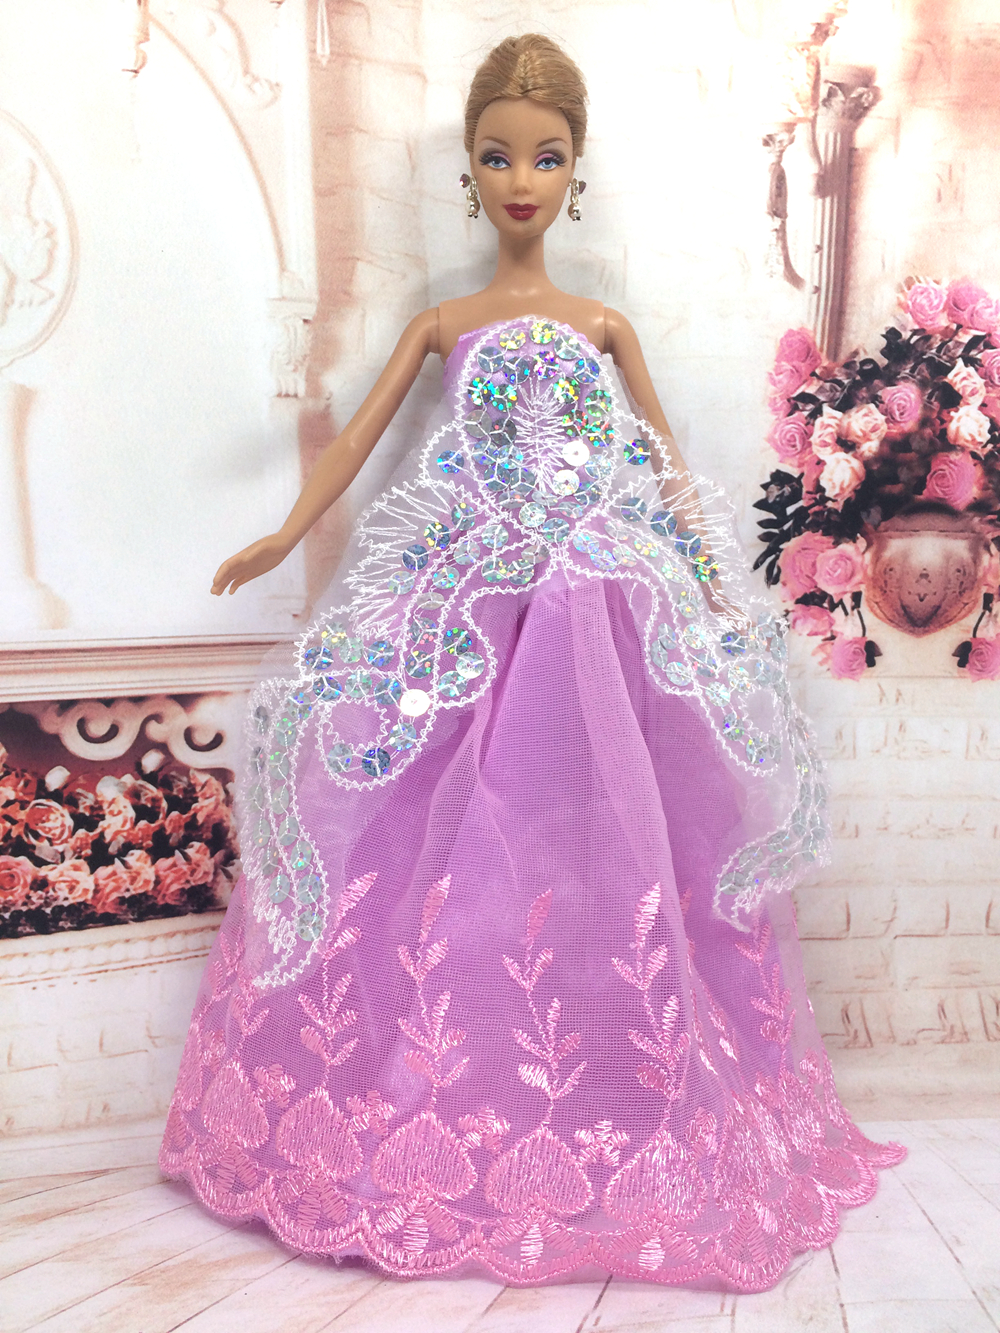 Barbie Costume Girls Promotion-Shop for Promotional Barbie Costume ...